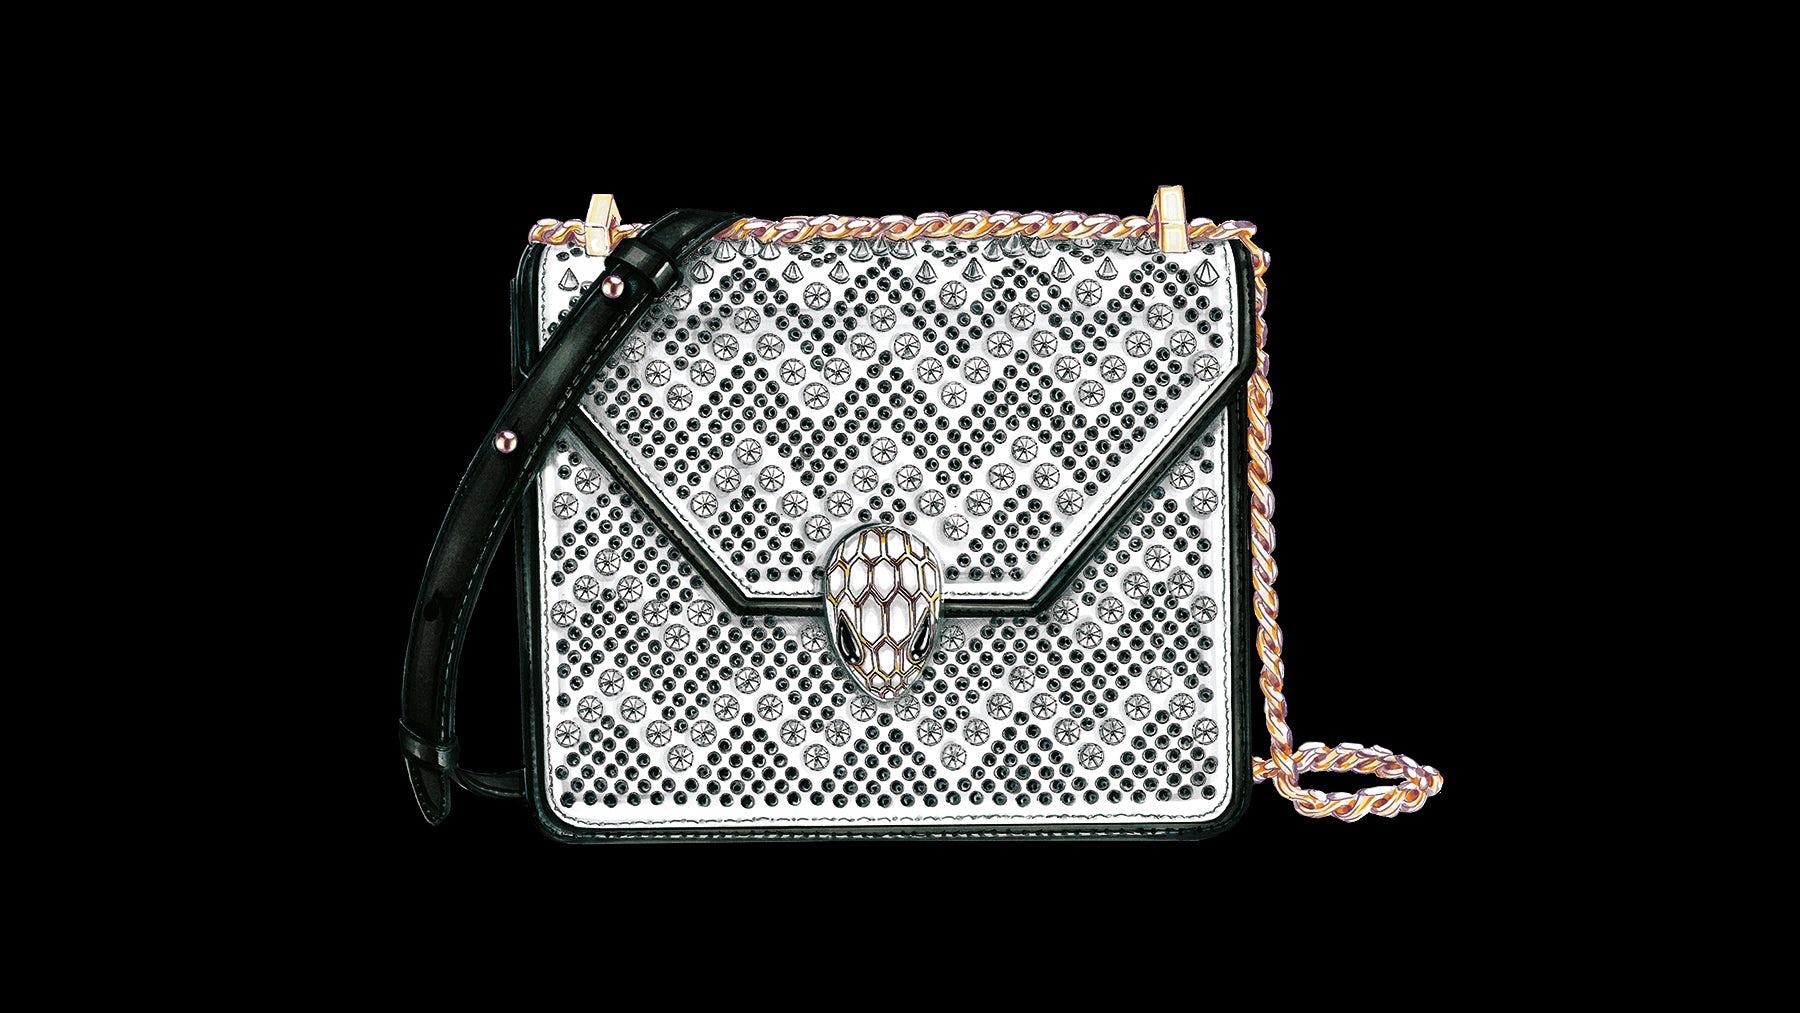 Nicholas Kirkwood Dips Into Handbags With Bulgari